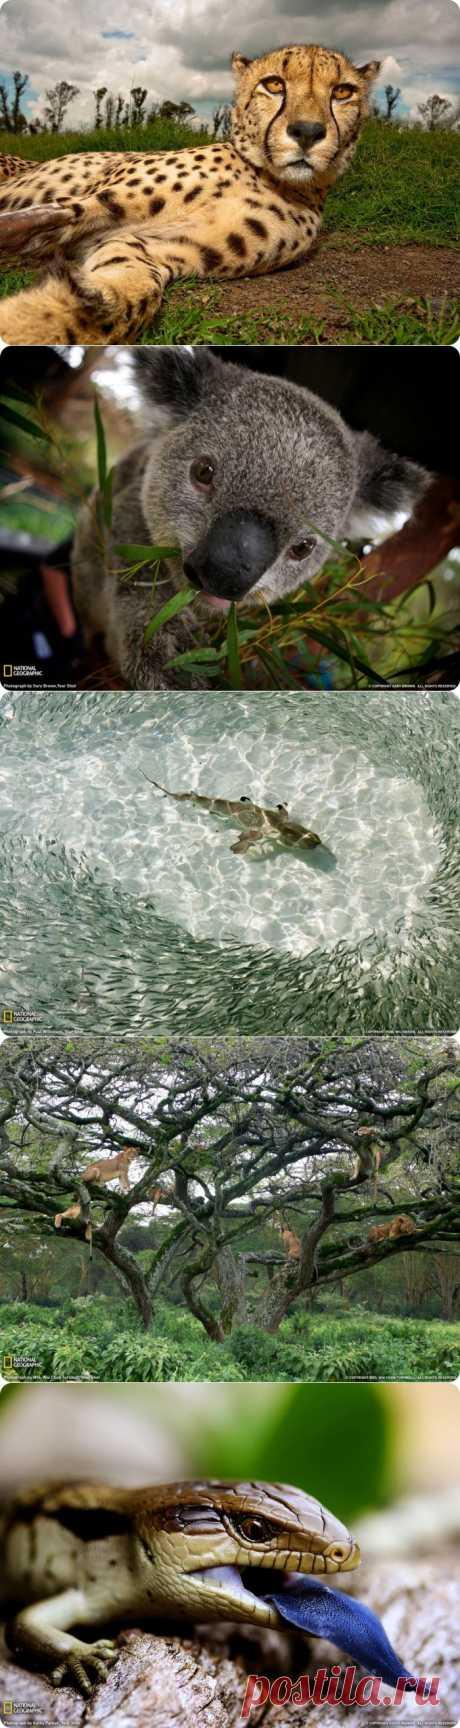 Фото National Geographic за июль 2011 из раздела Природа в интернет журнале zabort.ru